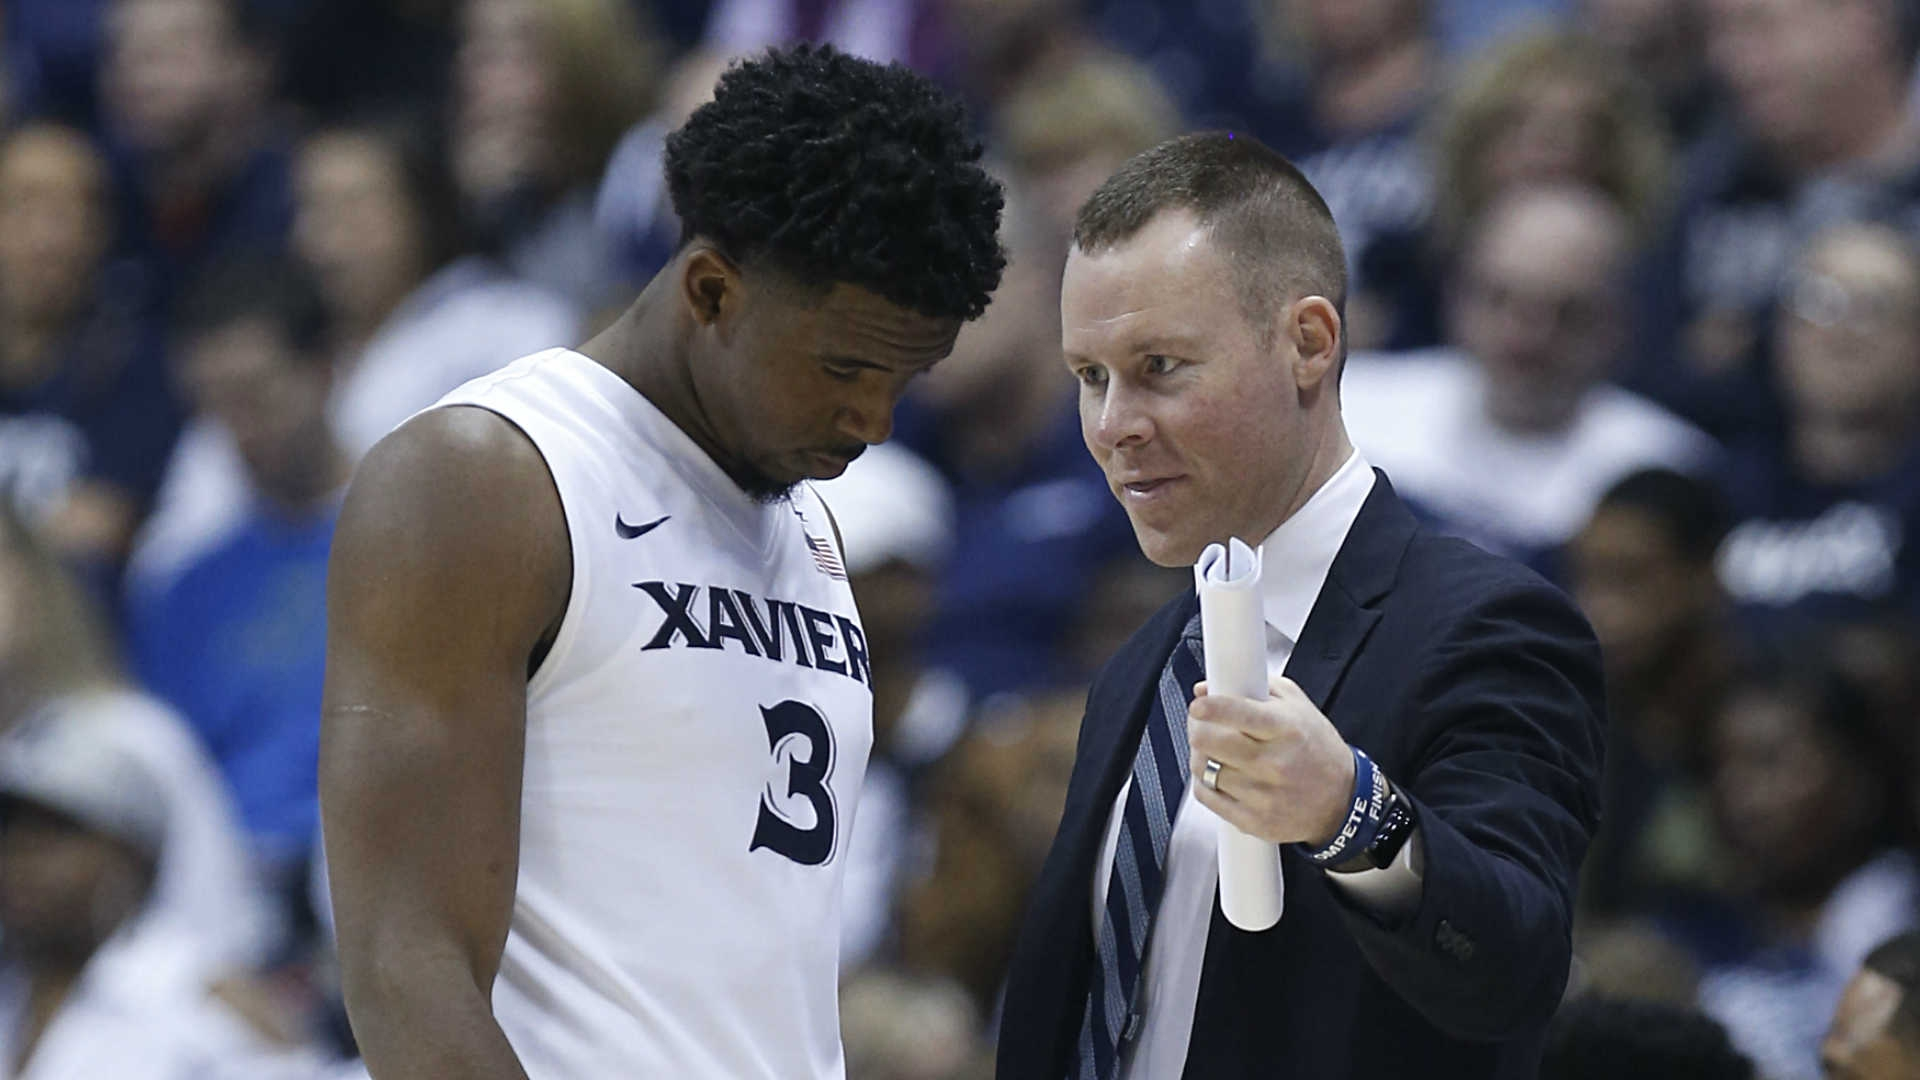 Xavier promotes Travis Steele to coach, replacing Mack